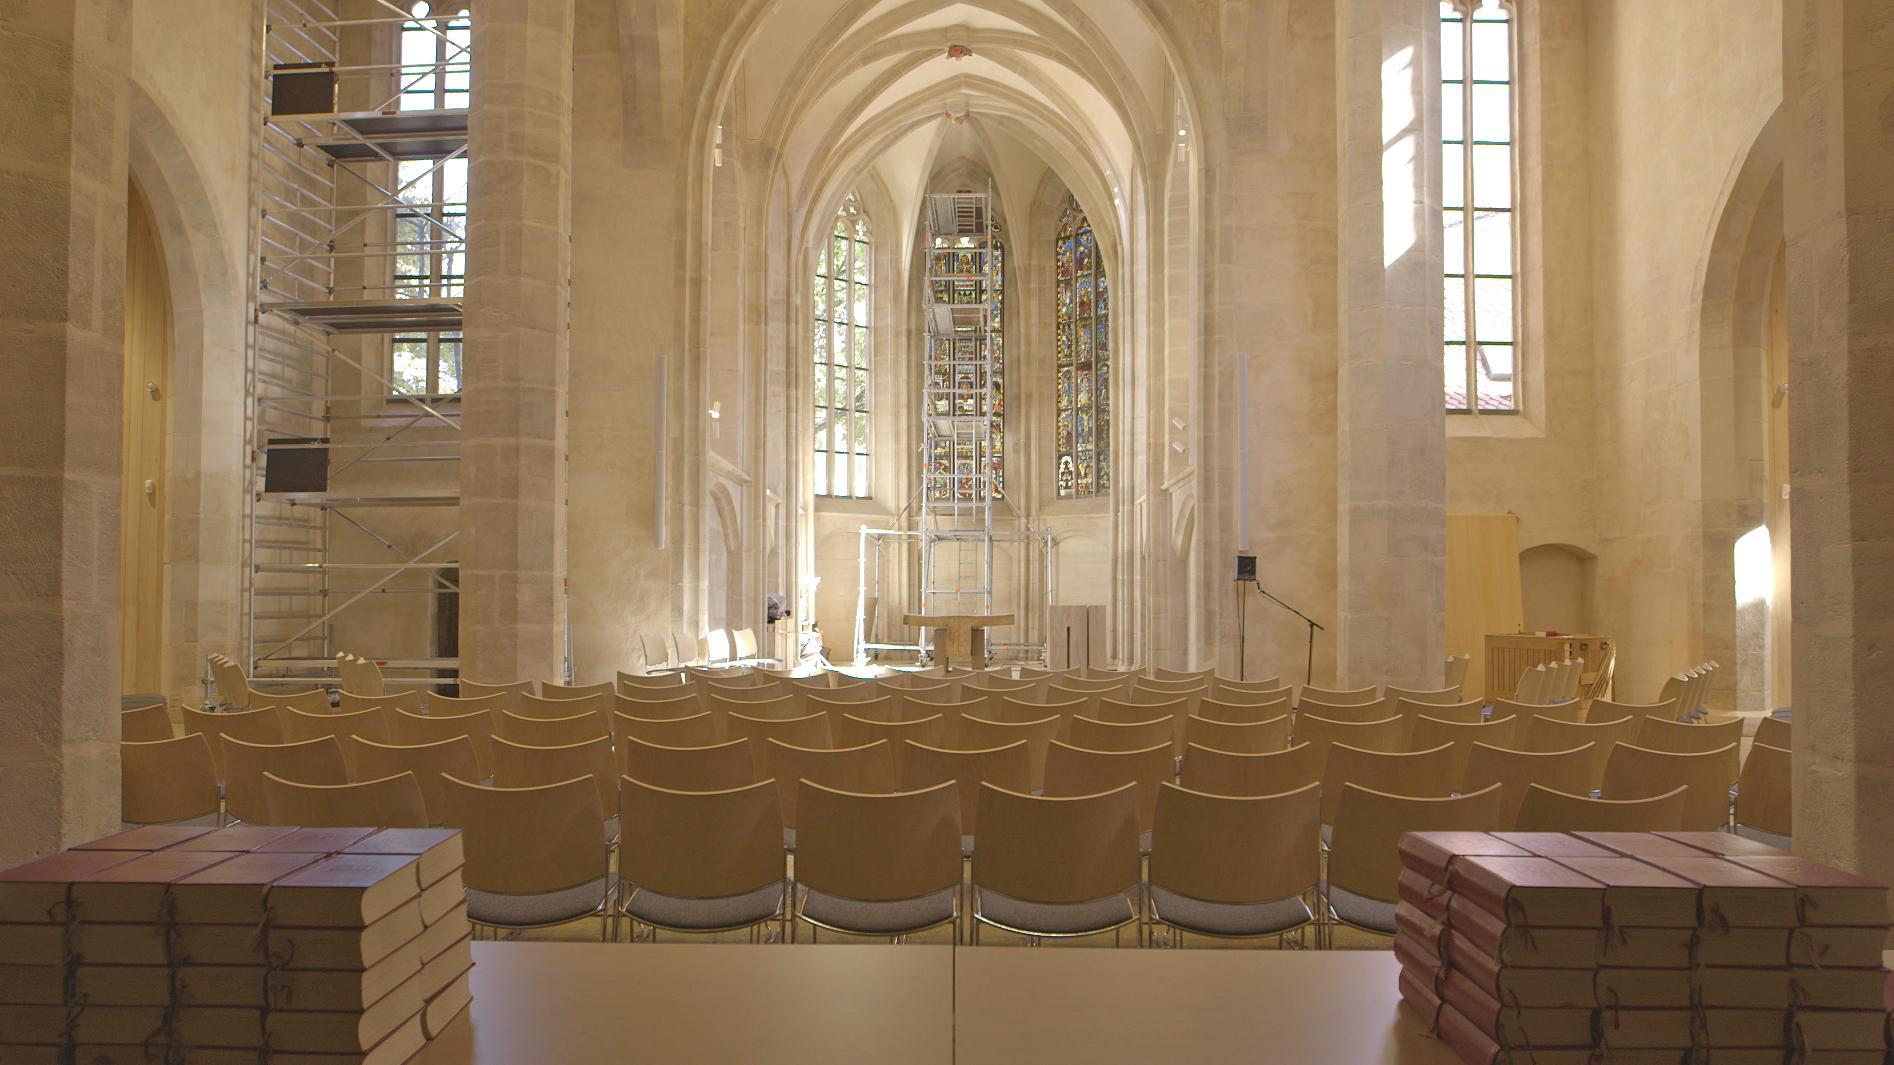 Innenansicht der Kirche St. Martha in Nürnberg.